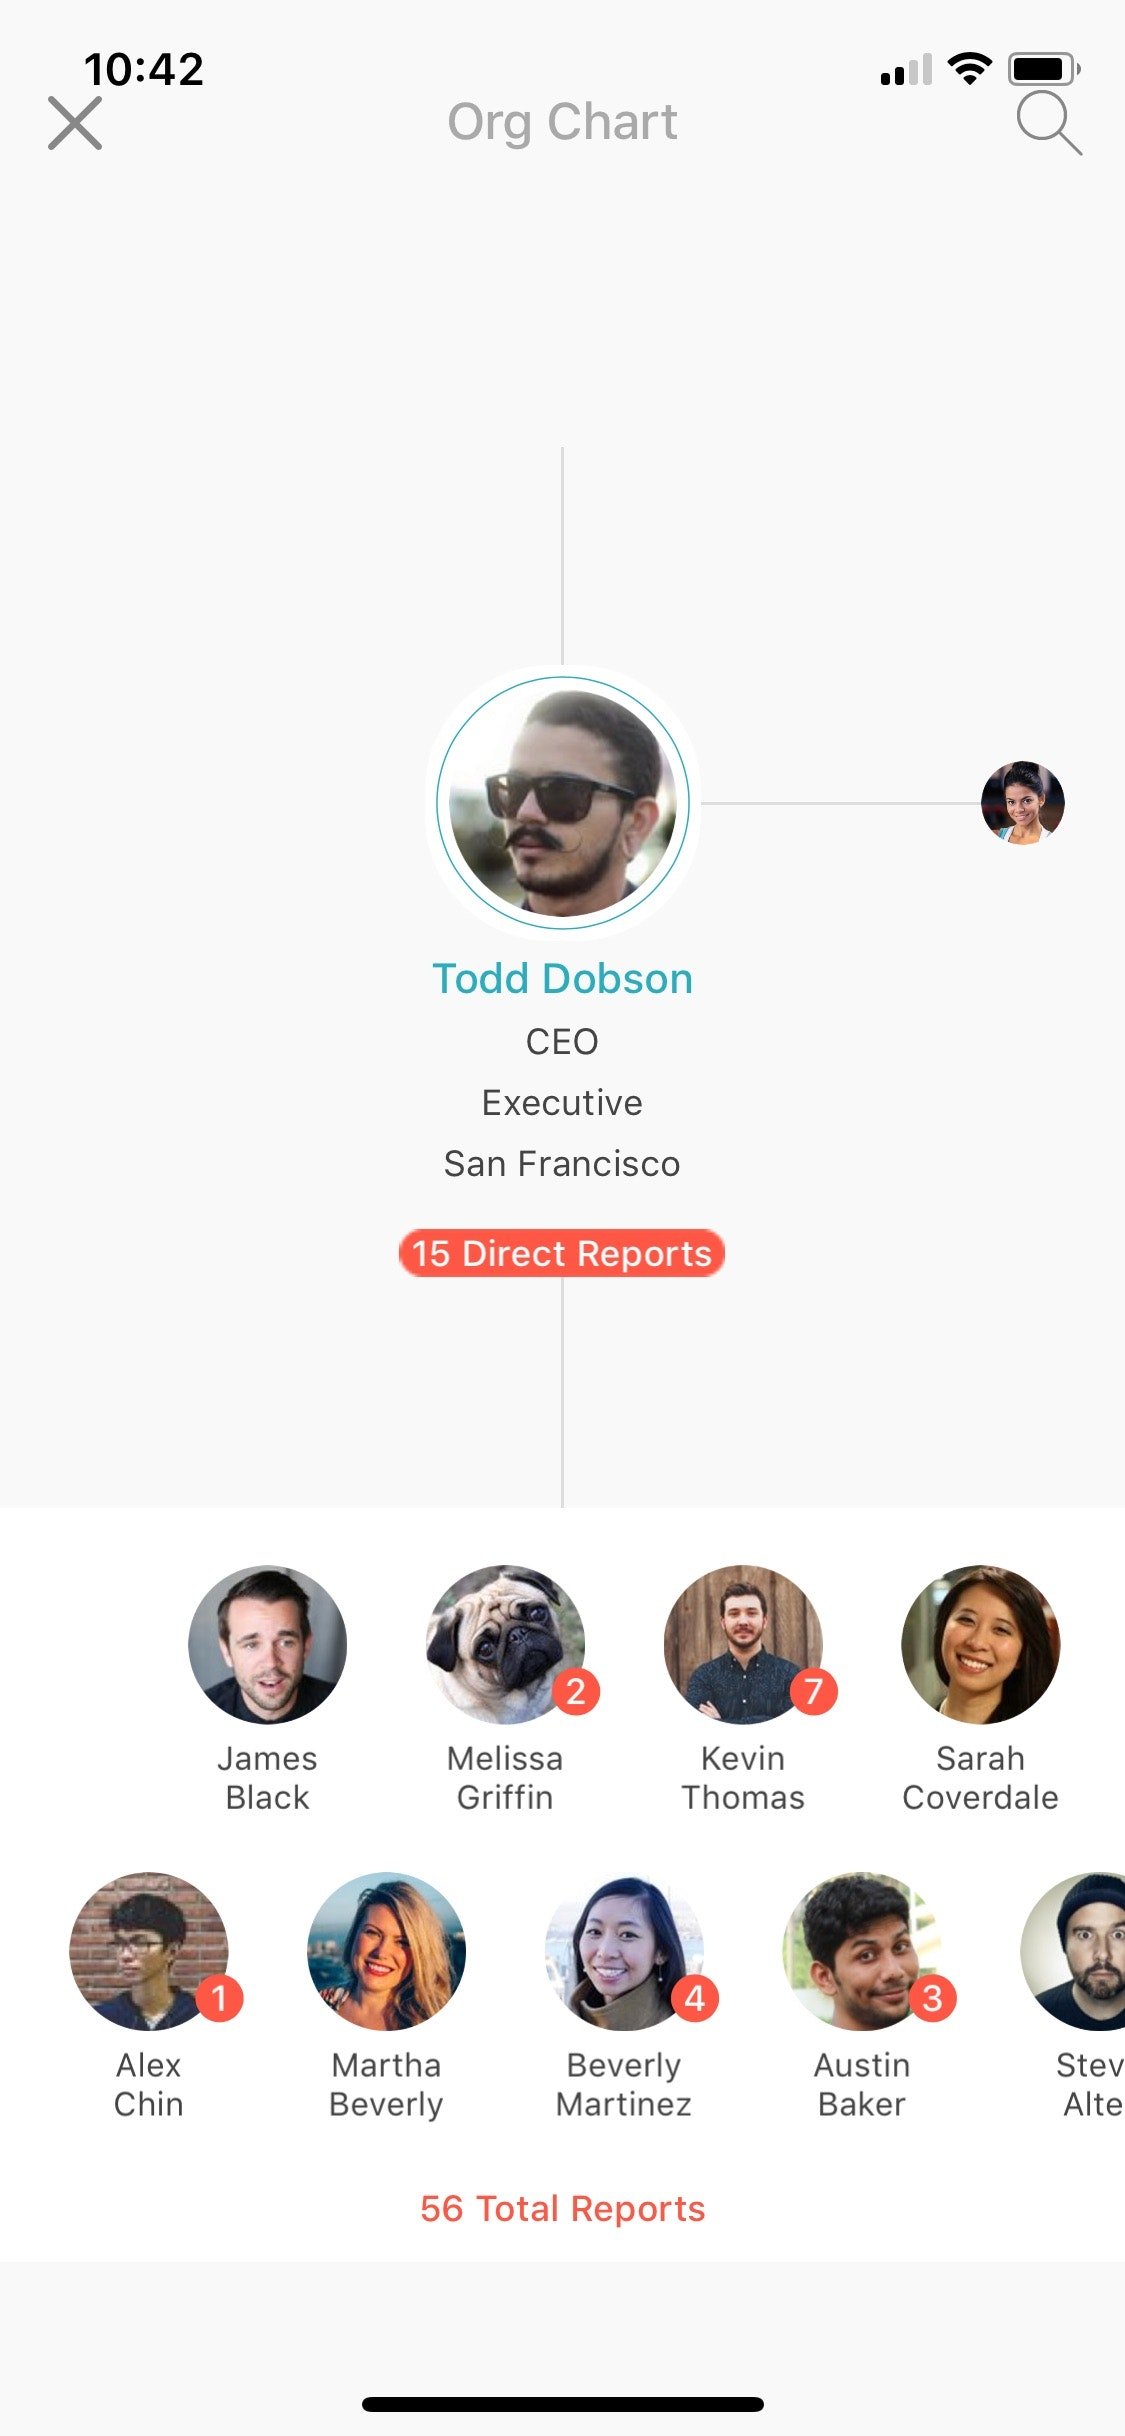 Mobile organization chart